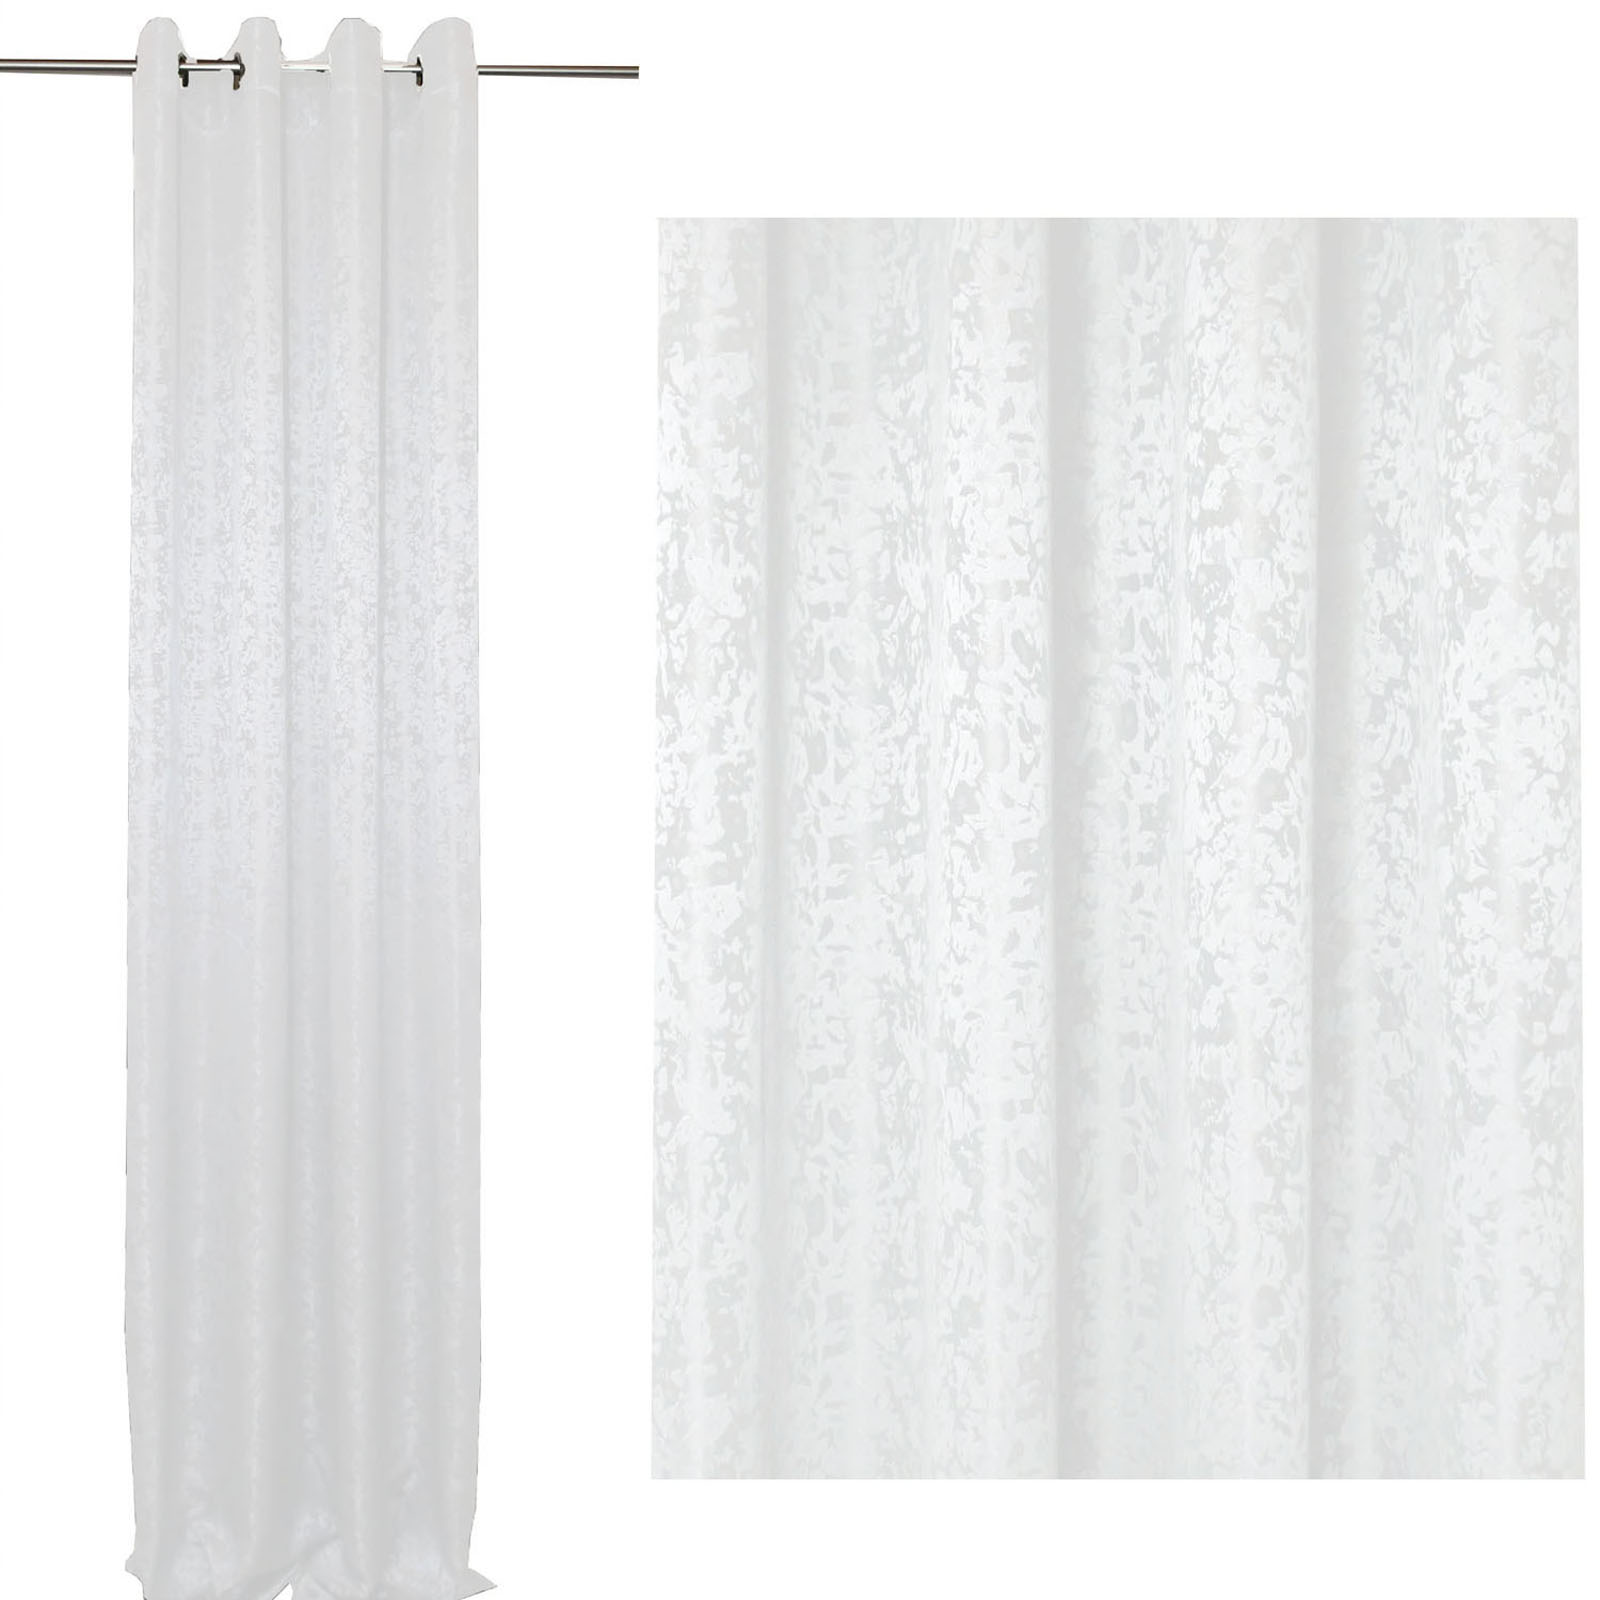 vorhang marmoriert sen 140 x 245 cm blickdicht gardine. Black Bedroom Furniture Sets. Home Design Ideas